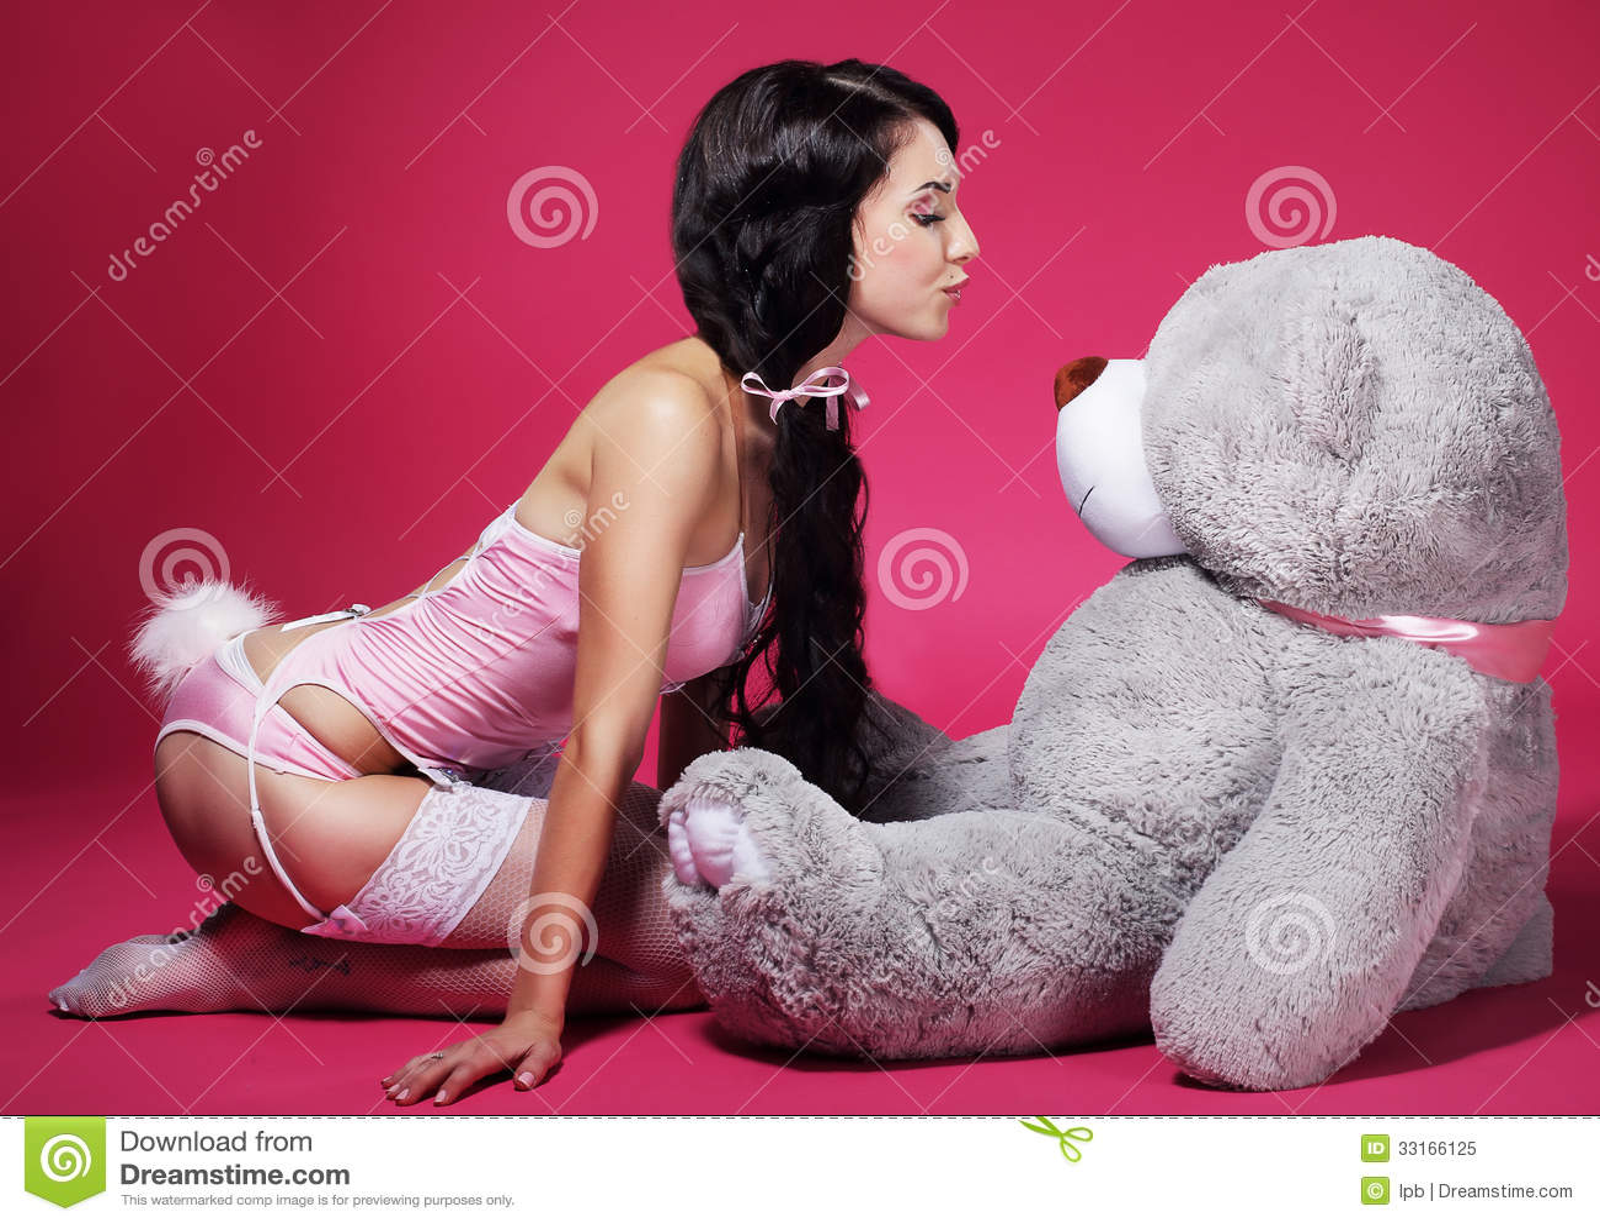 All charm! girl lingerie teddy